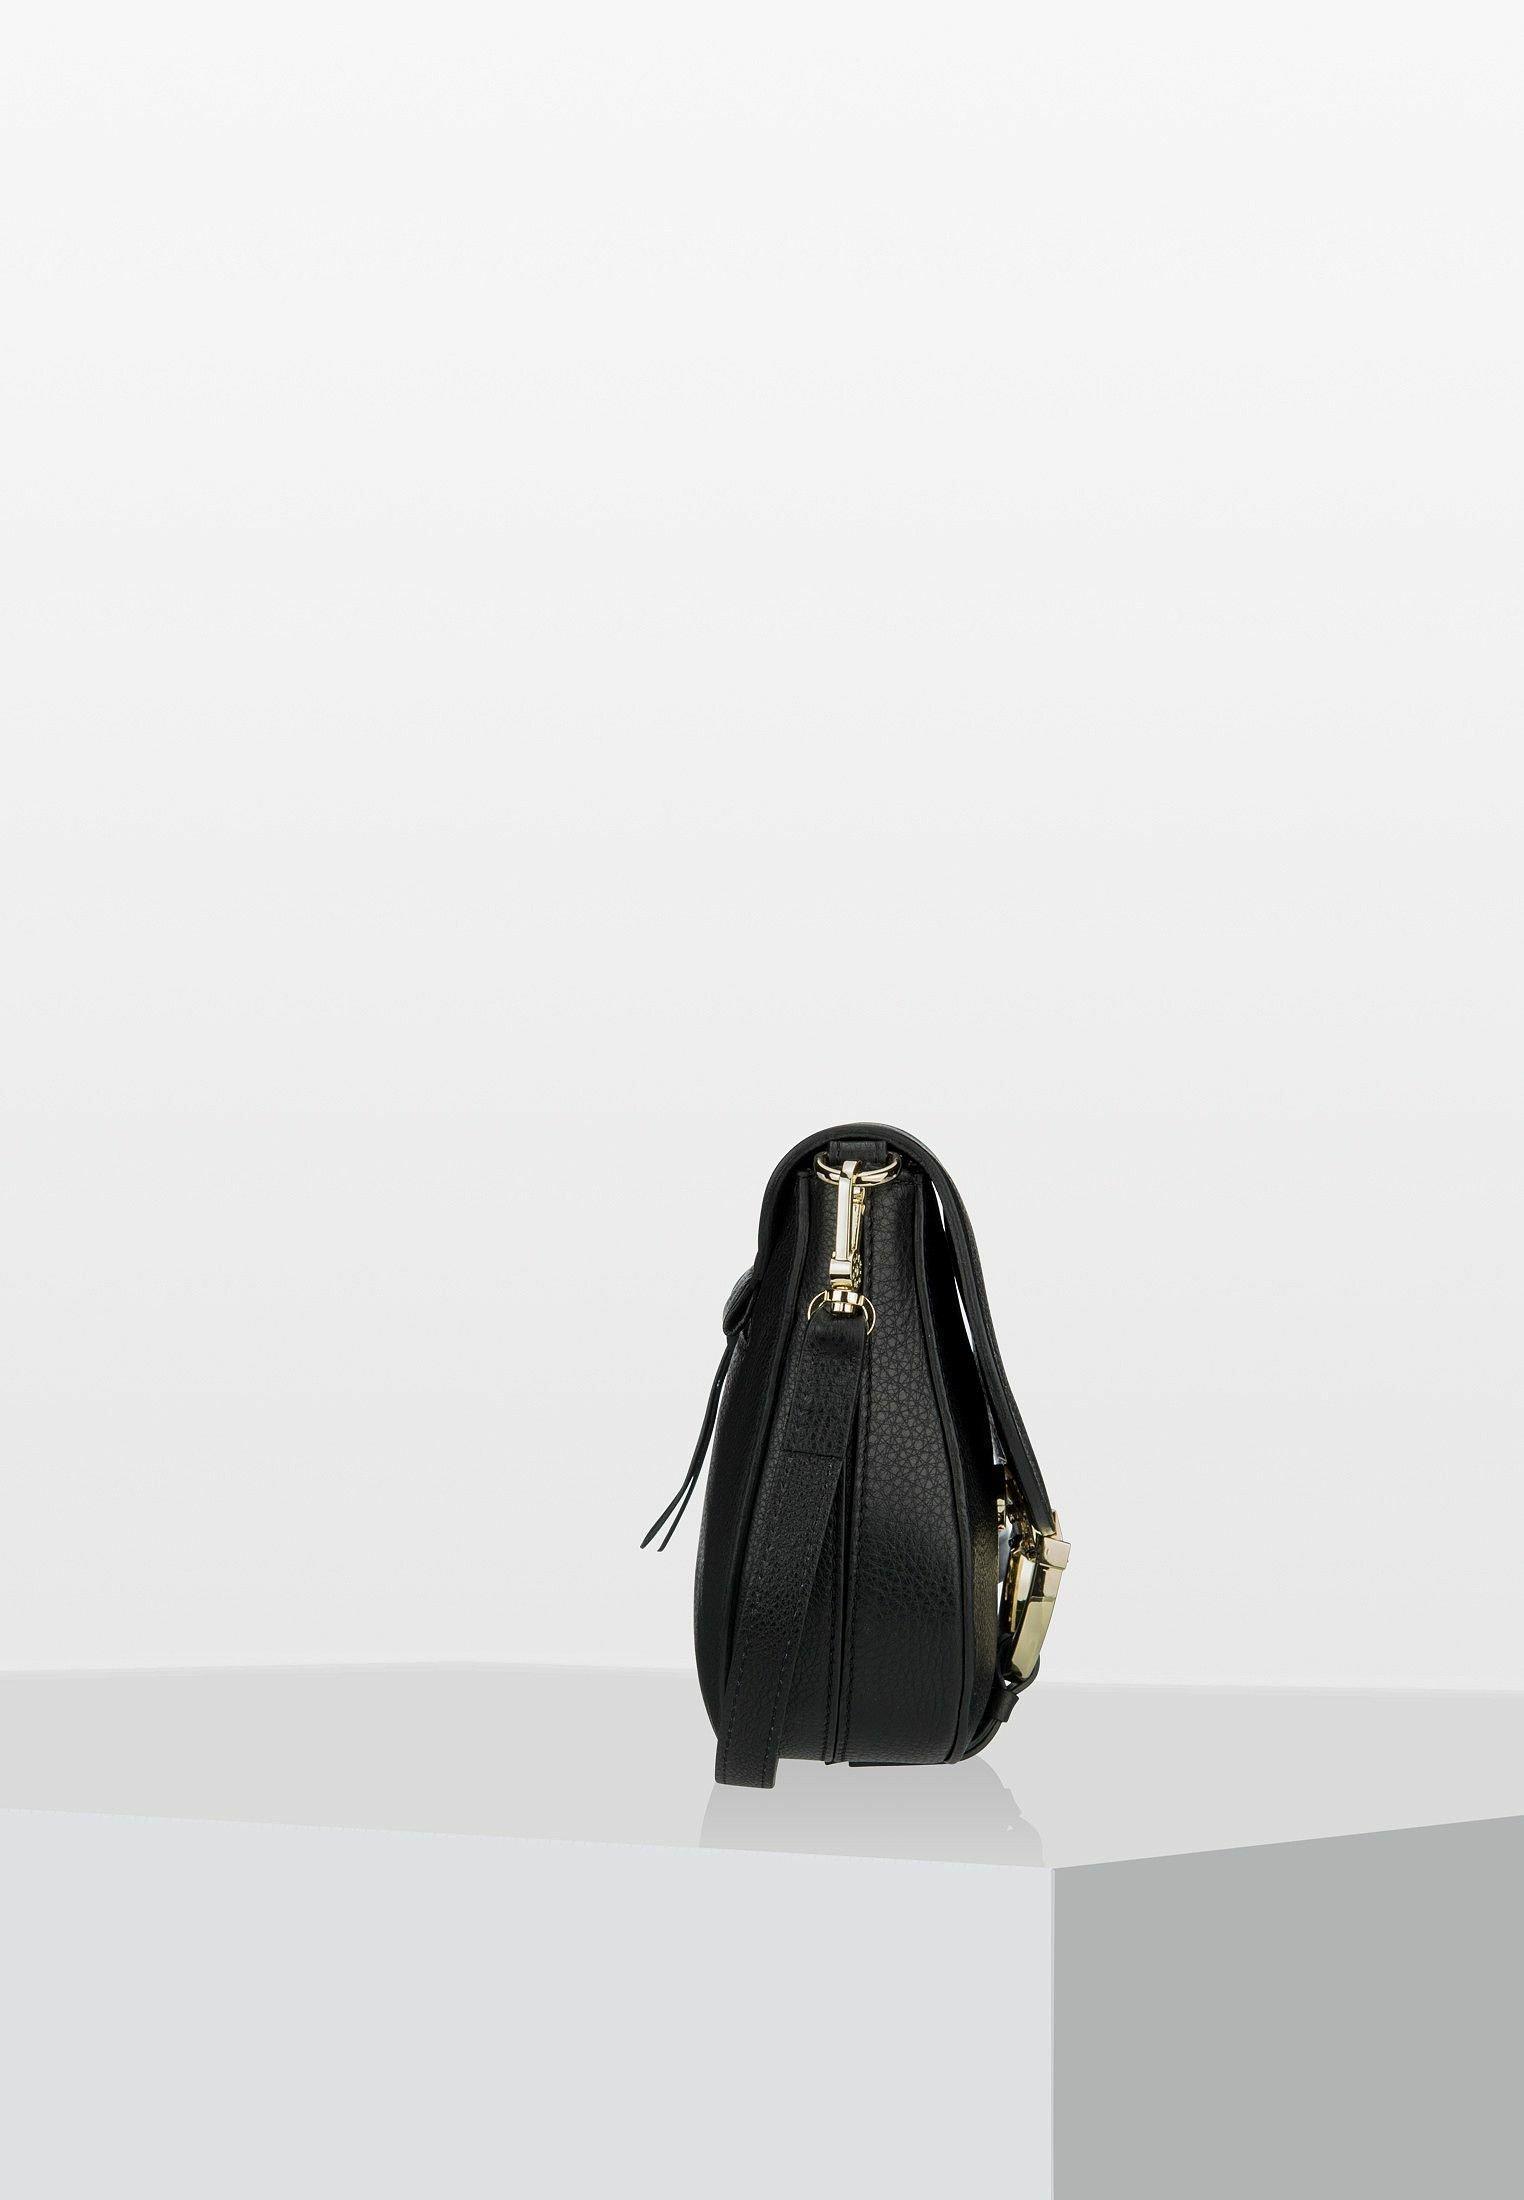 Abro Temi 28978 - Sac Bandoulière Black AWdm2xw